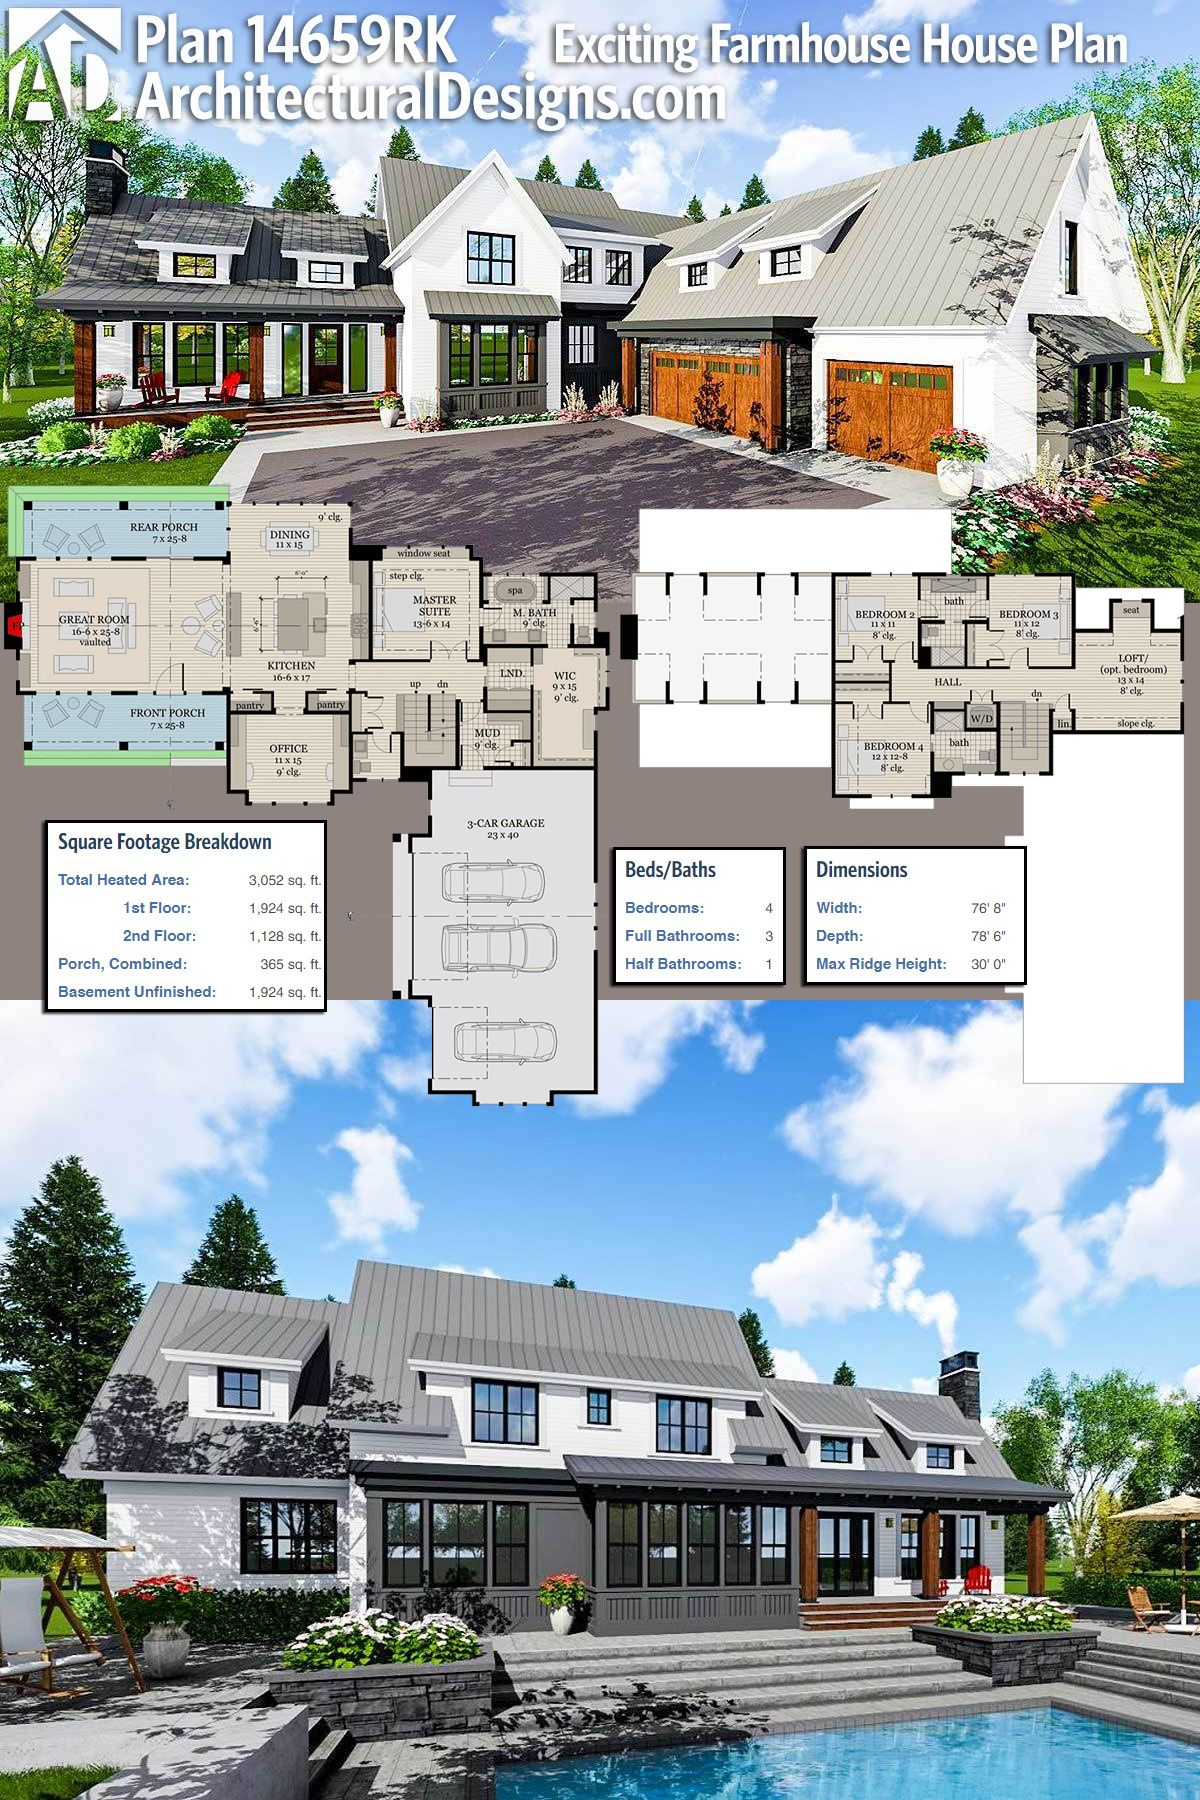 Plan 14659RK Exciting Farmhouse House Plan Modern